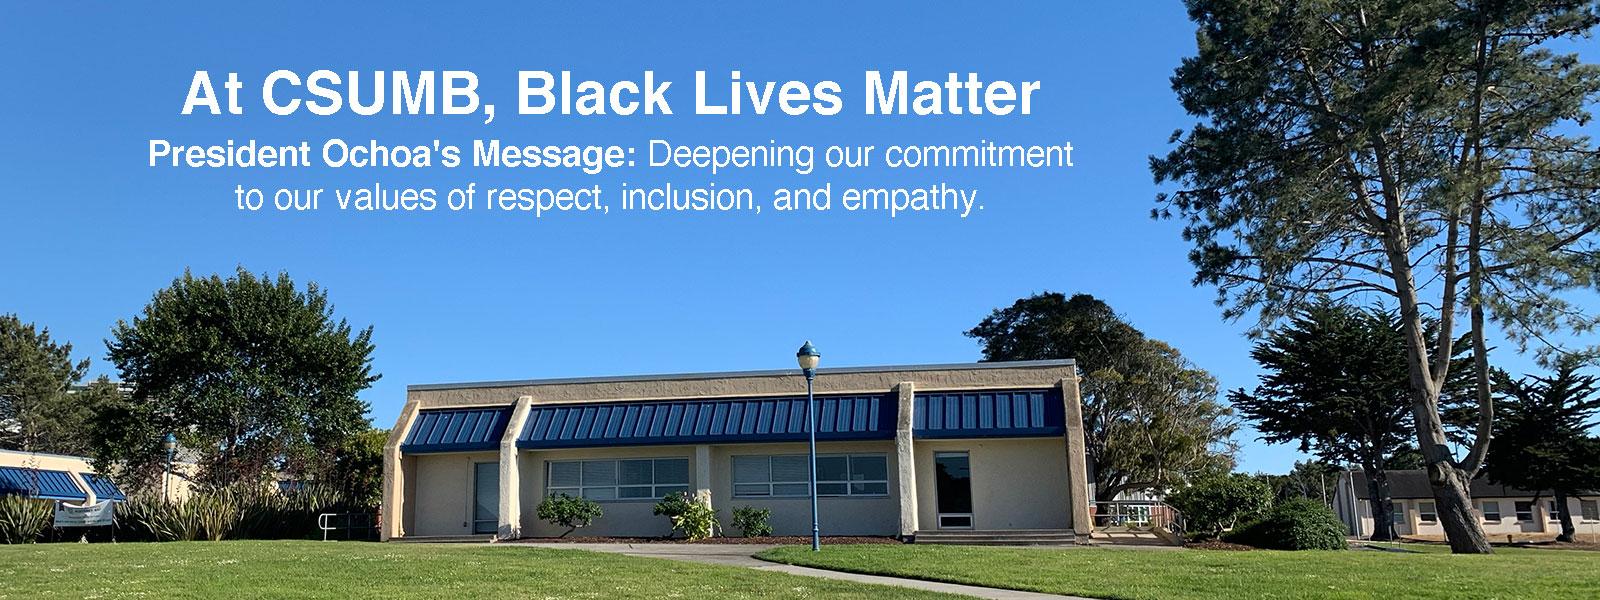 At CSUMB, Black Lives Matter | President Ochoa's Message about George Floyd